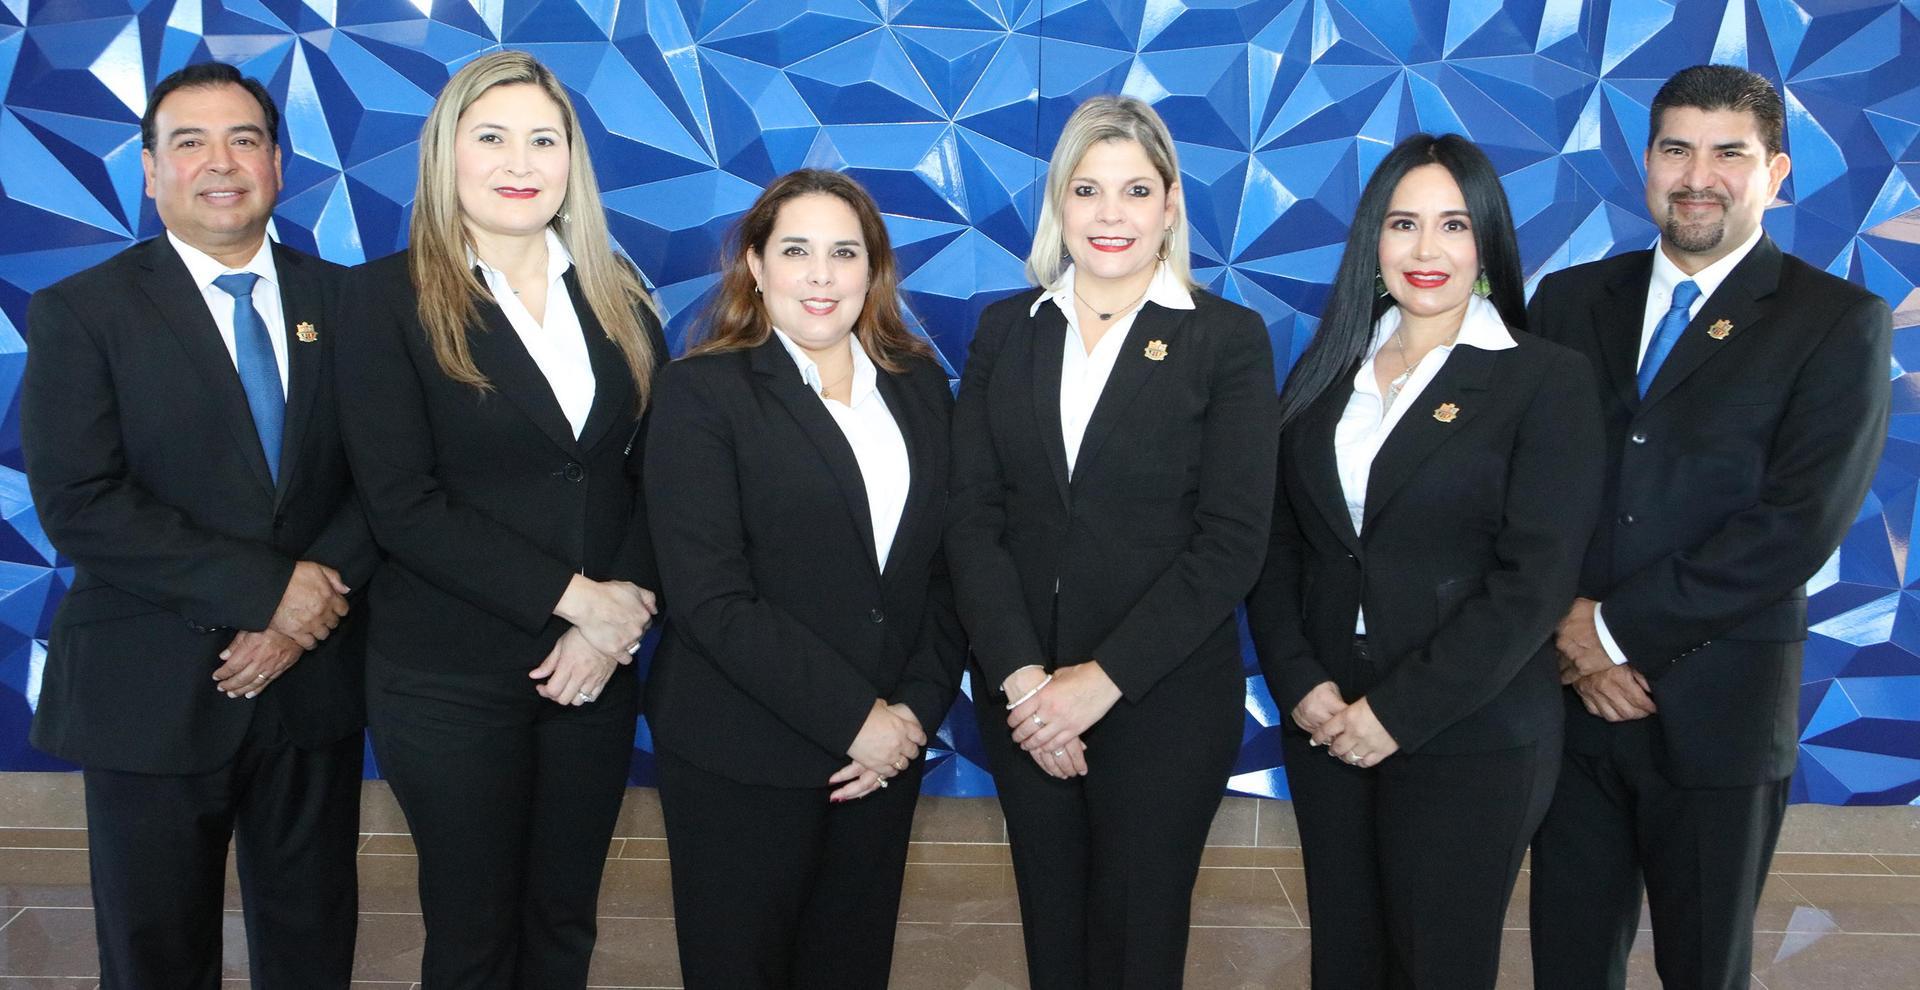 RVHS Administration, Vela, Principals